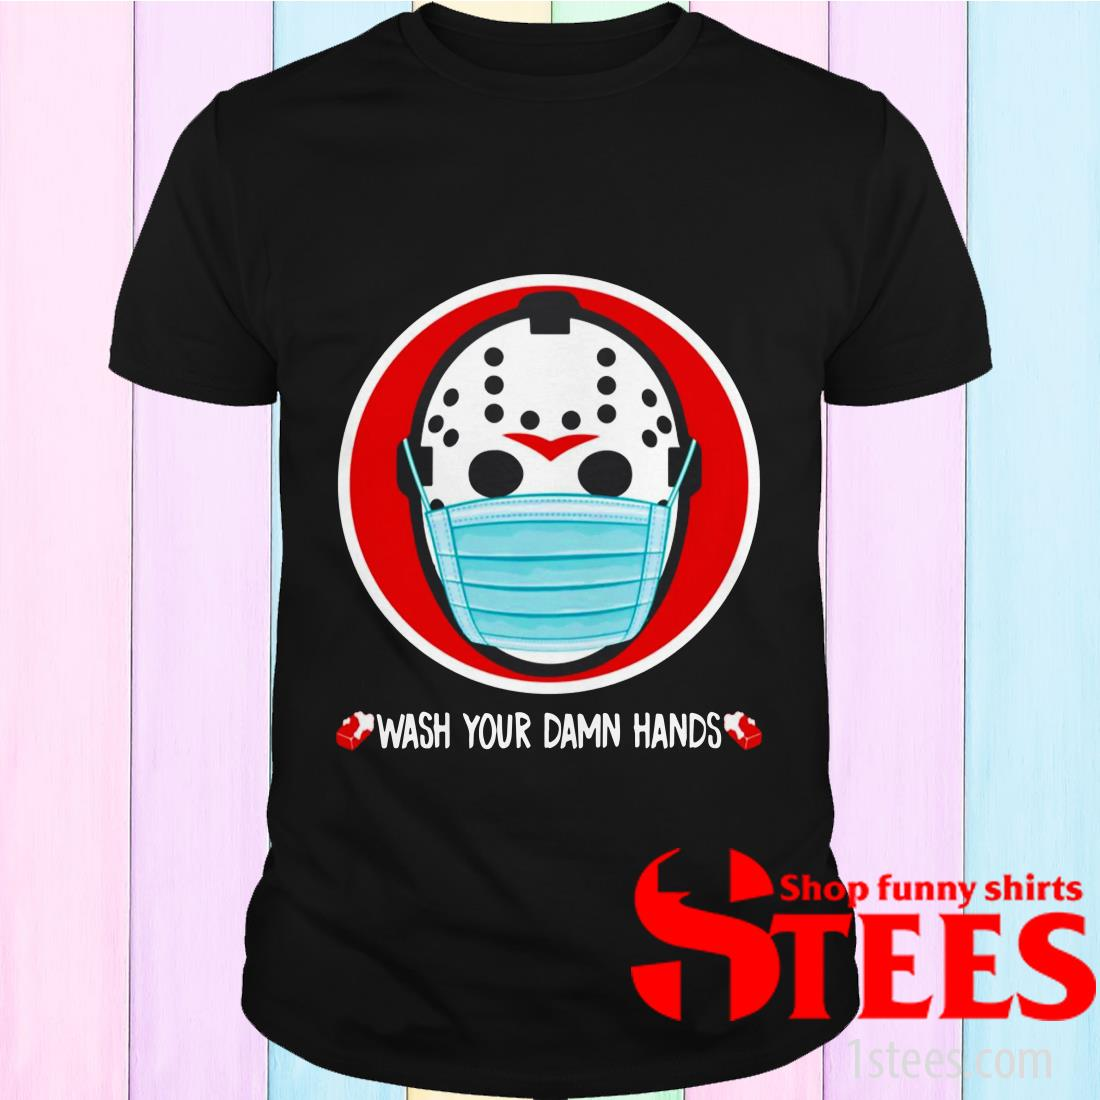 Jason Voorhees Face Mask Wash Your Damn Hands Shirt